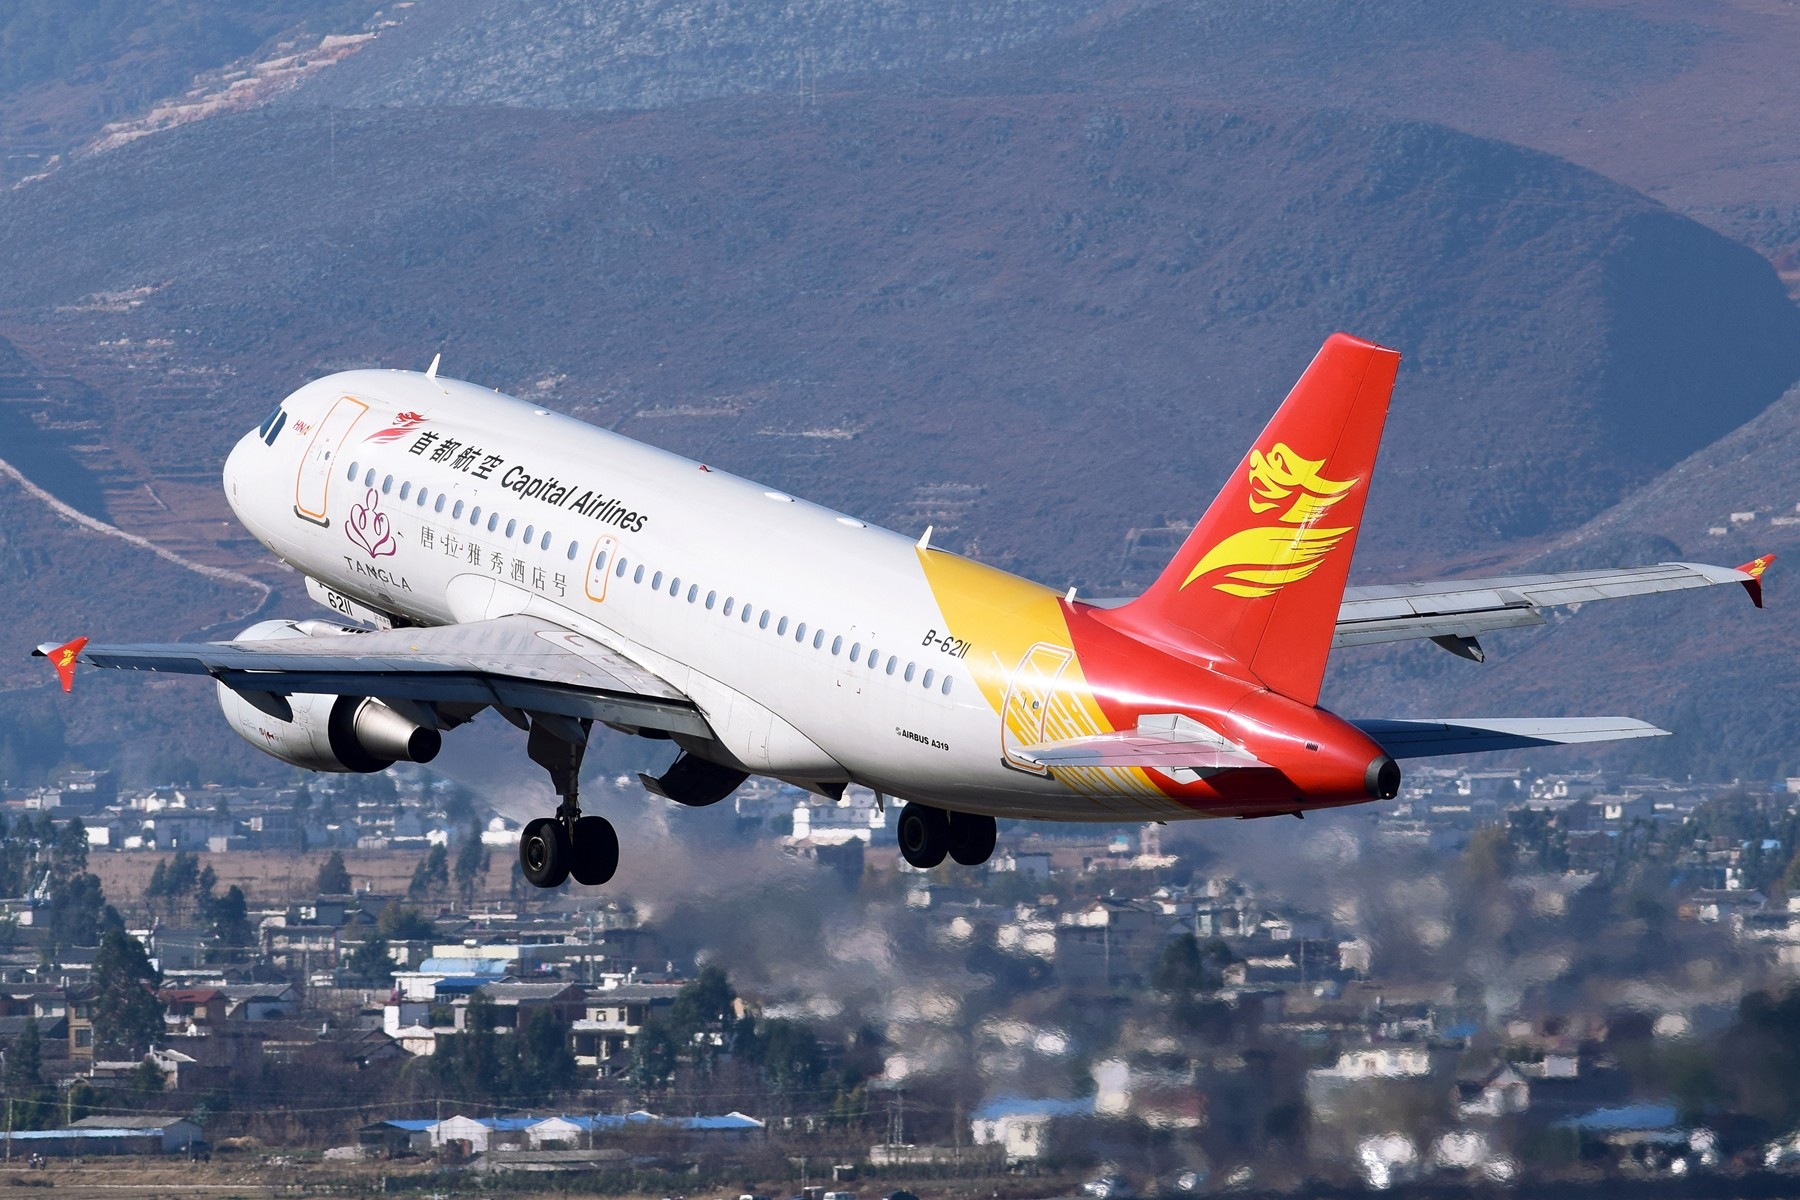 Re:[原创]补发的拍机游记---Day Trip for 丽江三义 AIRBUS A319-100 B-6211 中国丽江三义机场